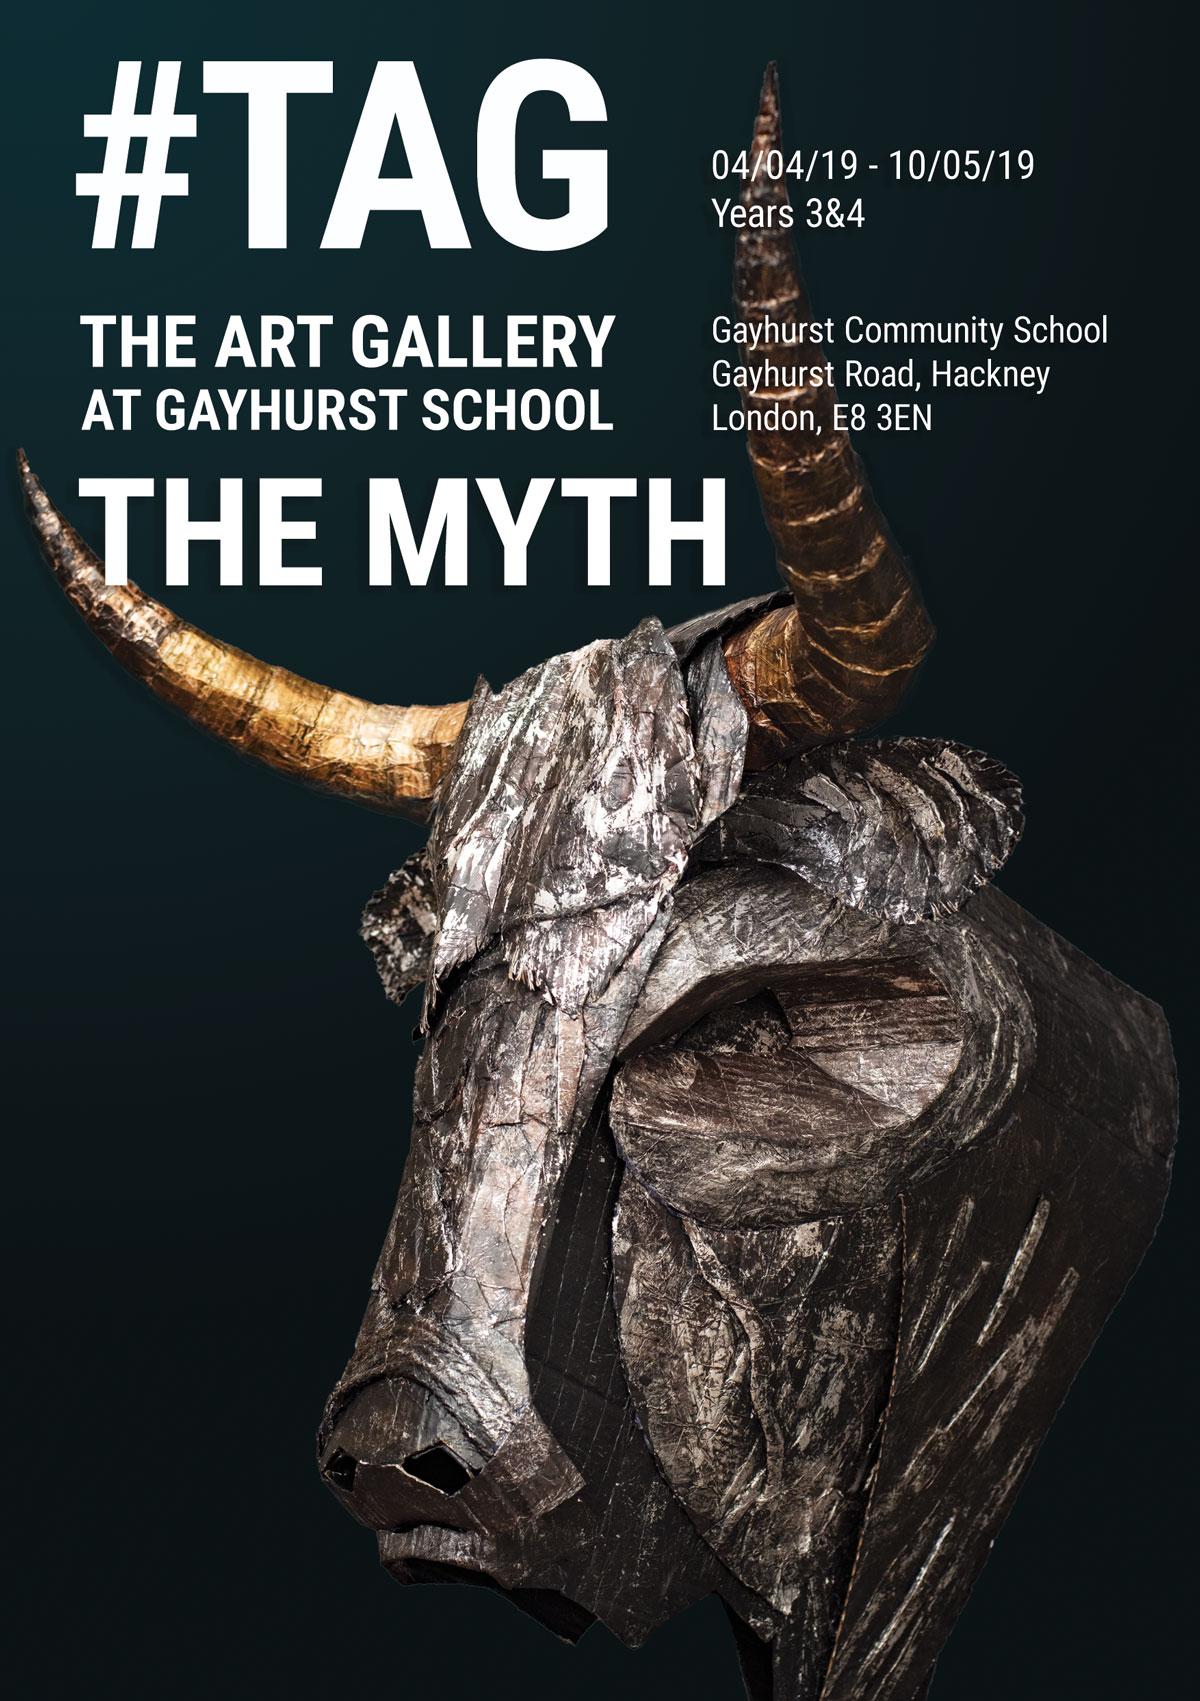 MYTH-leaflet-front-web